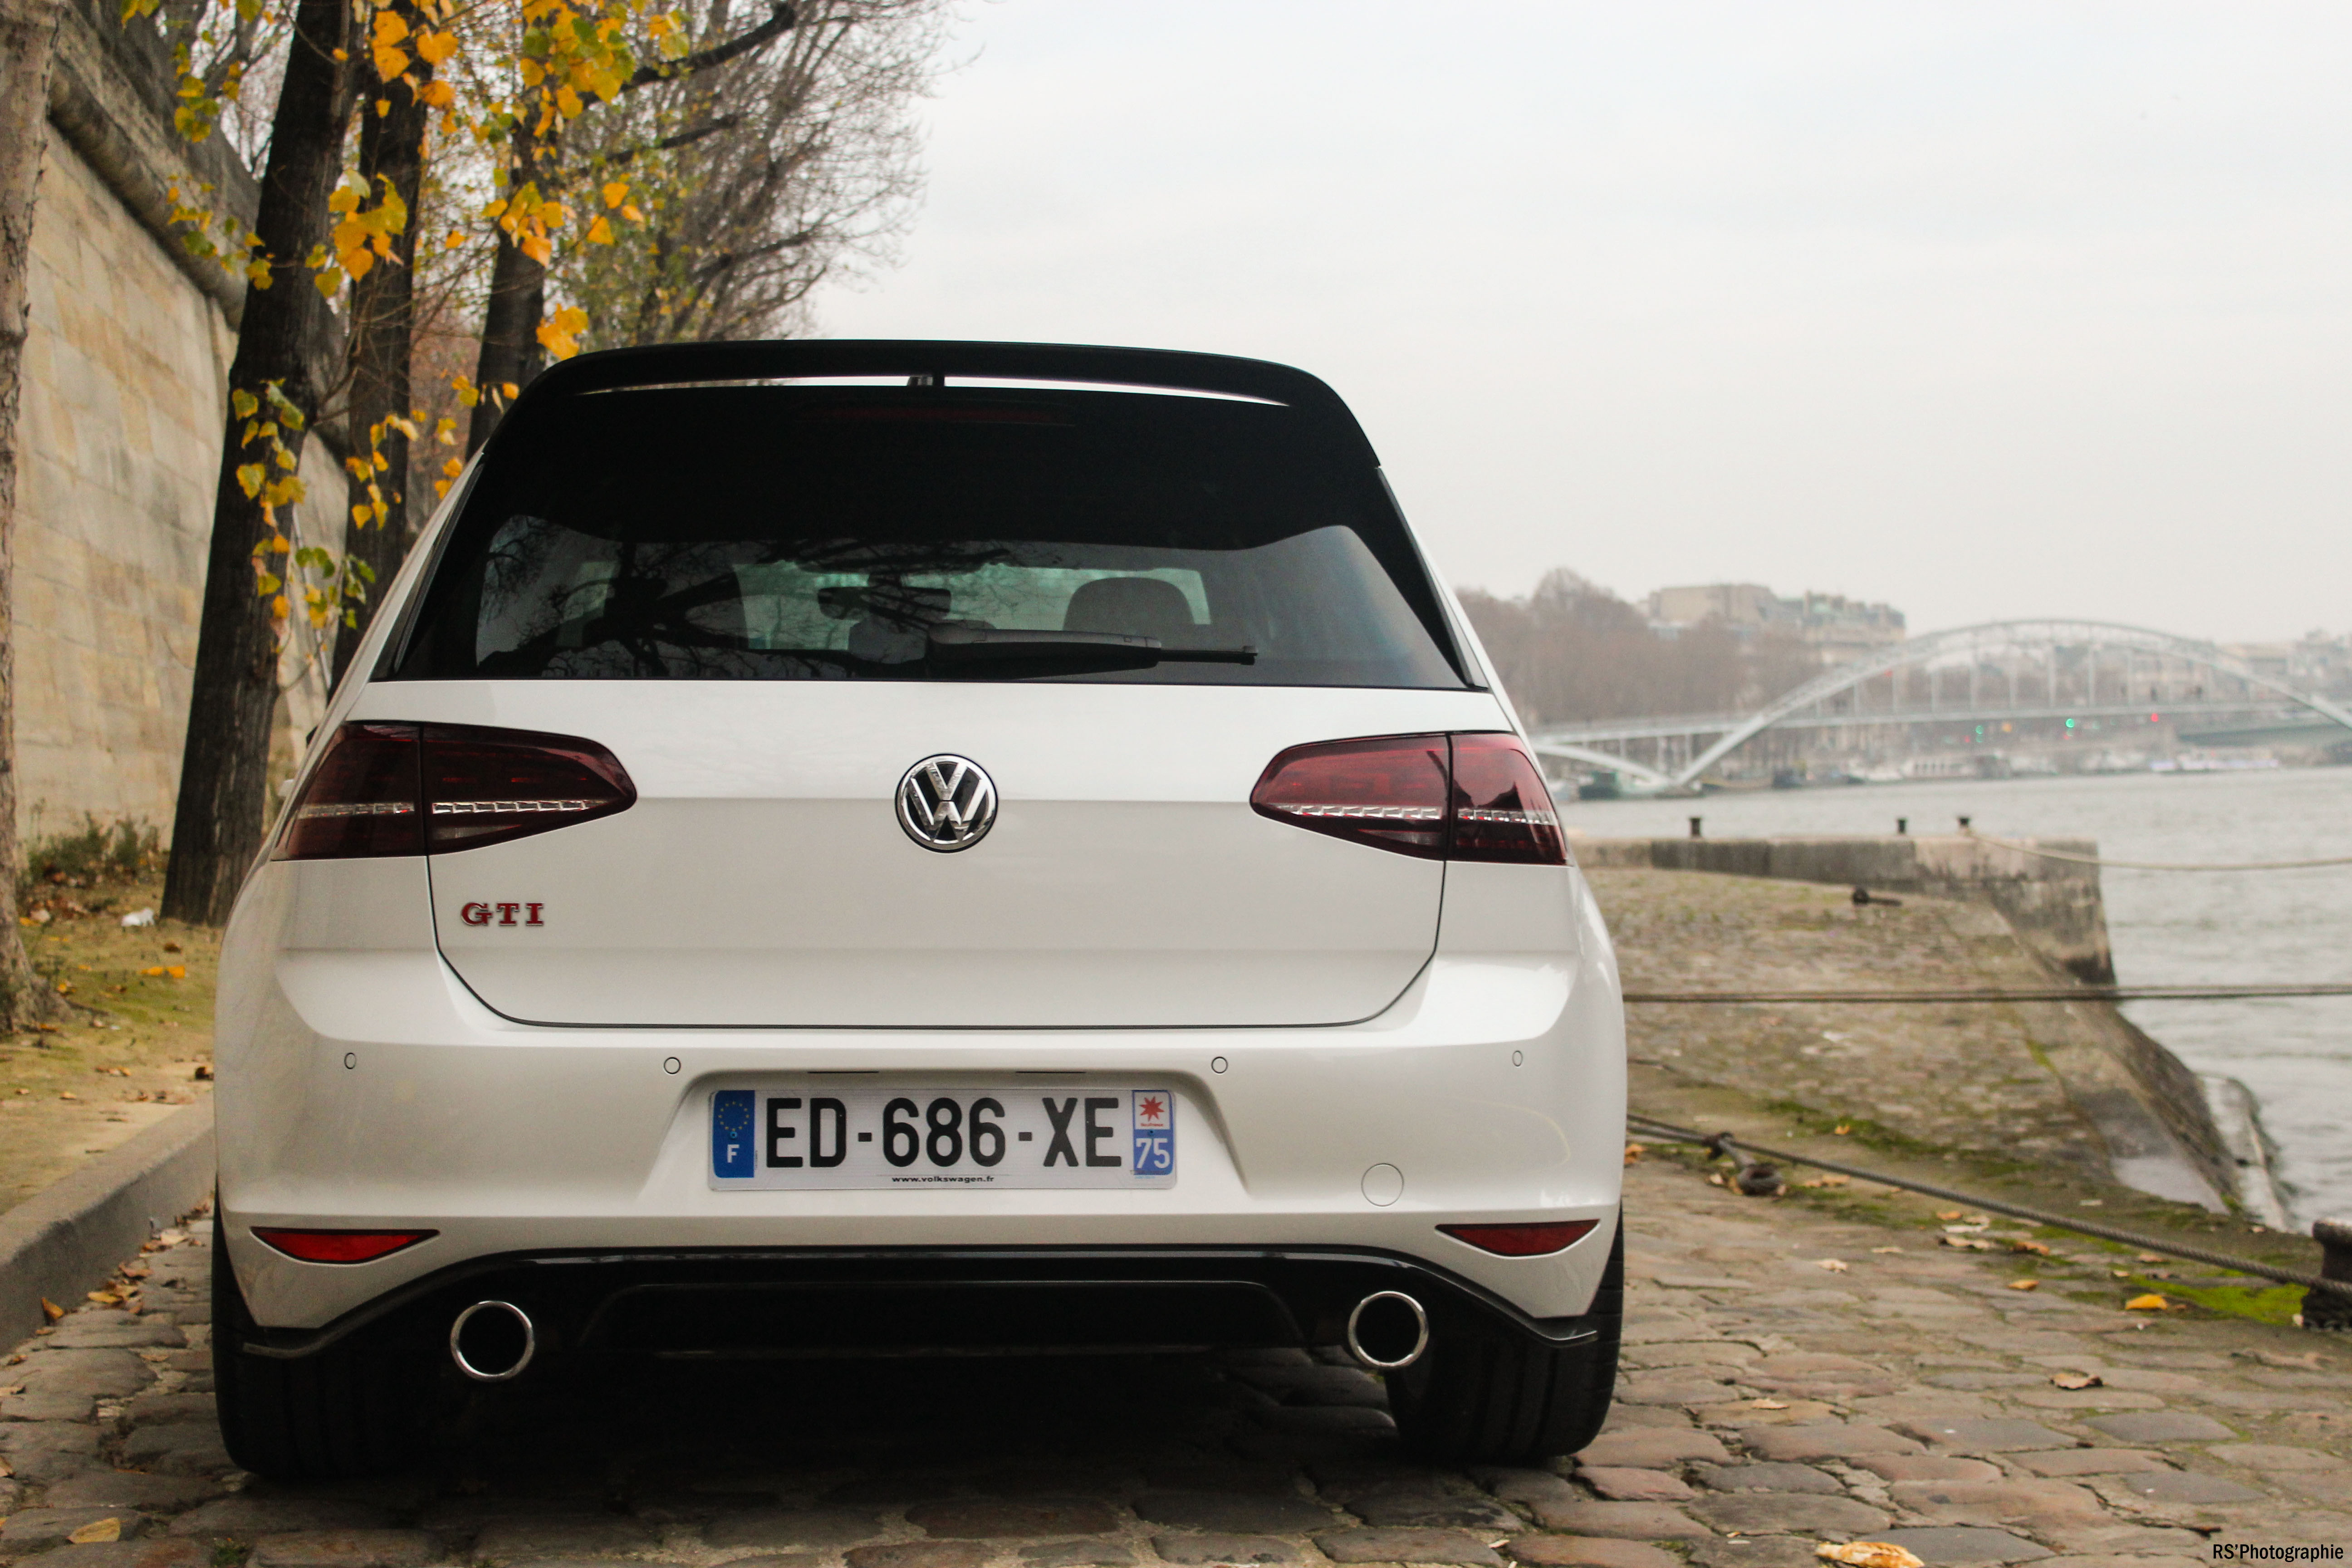 vwgolfgticlubsport21-volkswagen-golf-gti-clubsport-arriere-rear-arnaud-demasier-rsphotographie